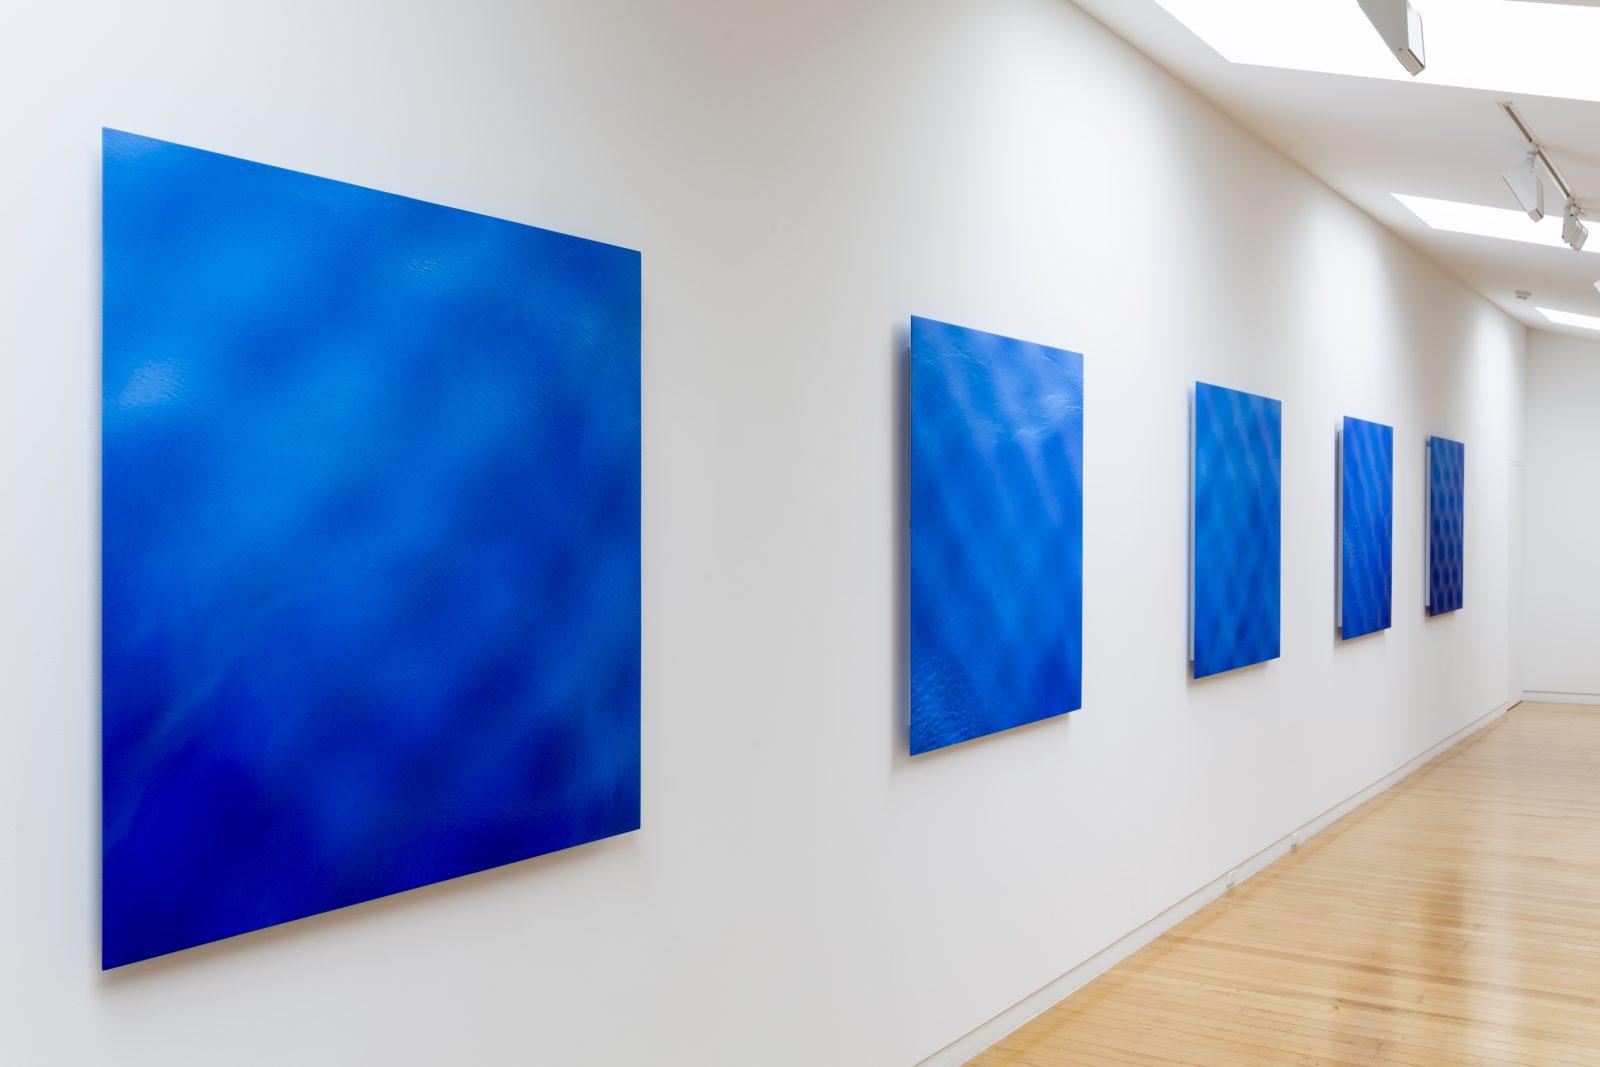 Elizabeth Thomson featured artwork